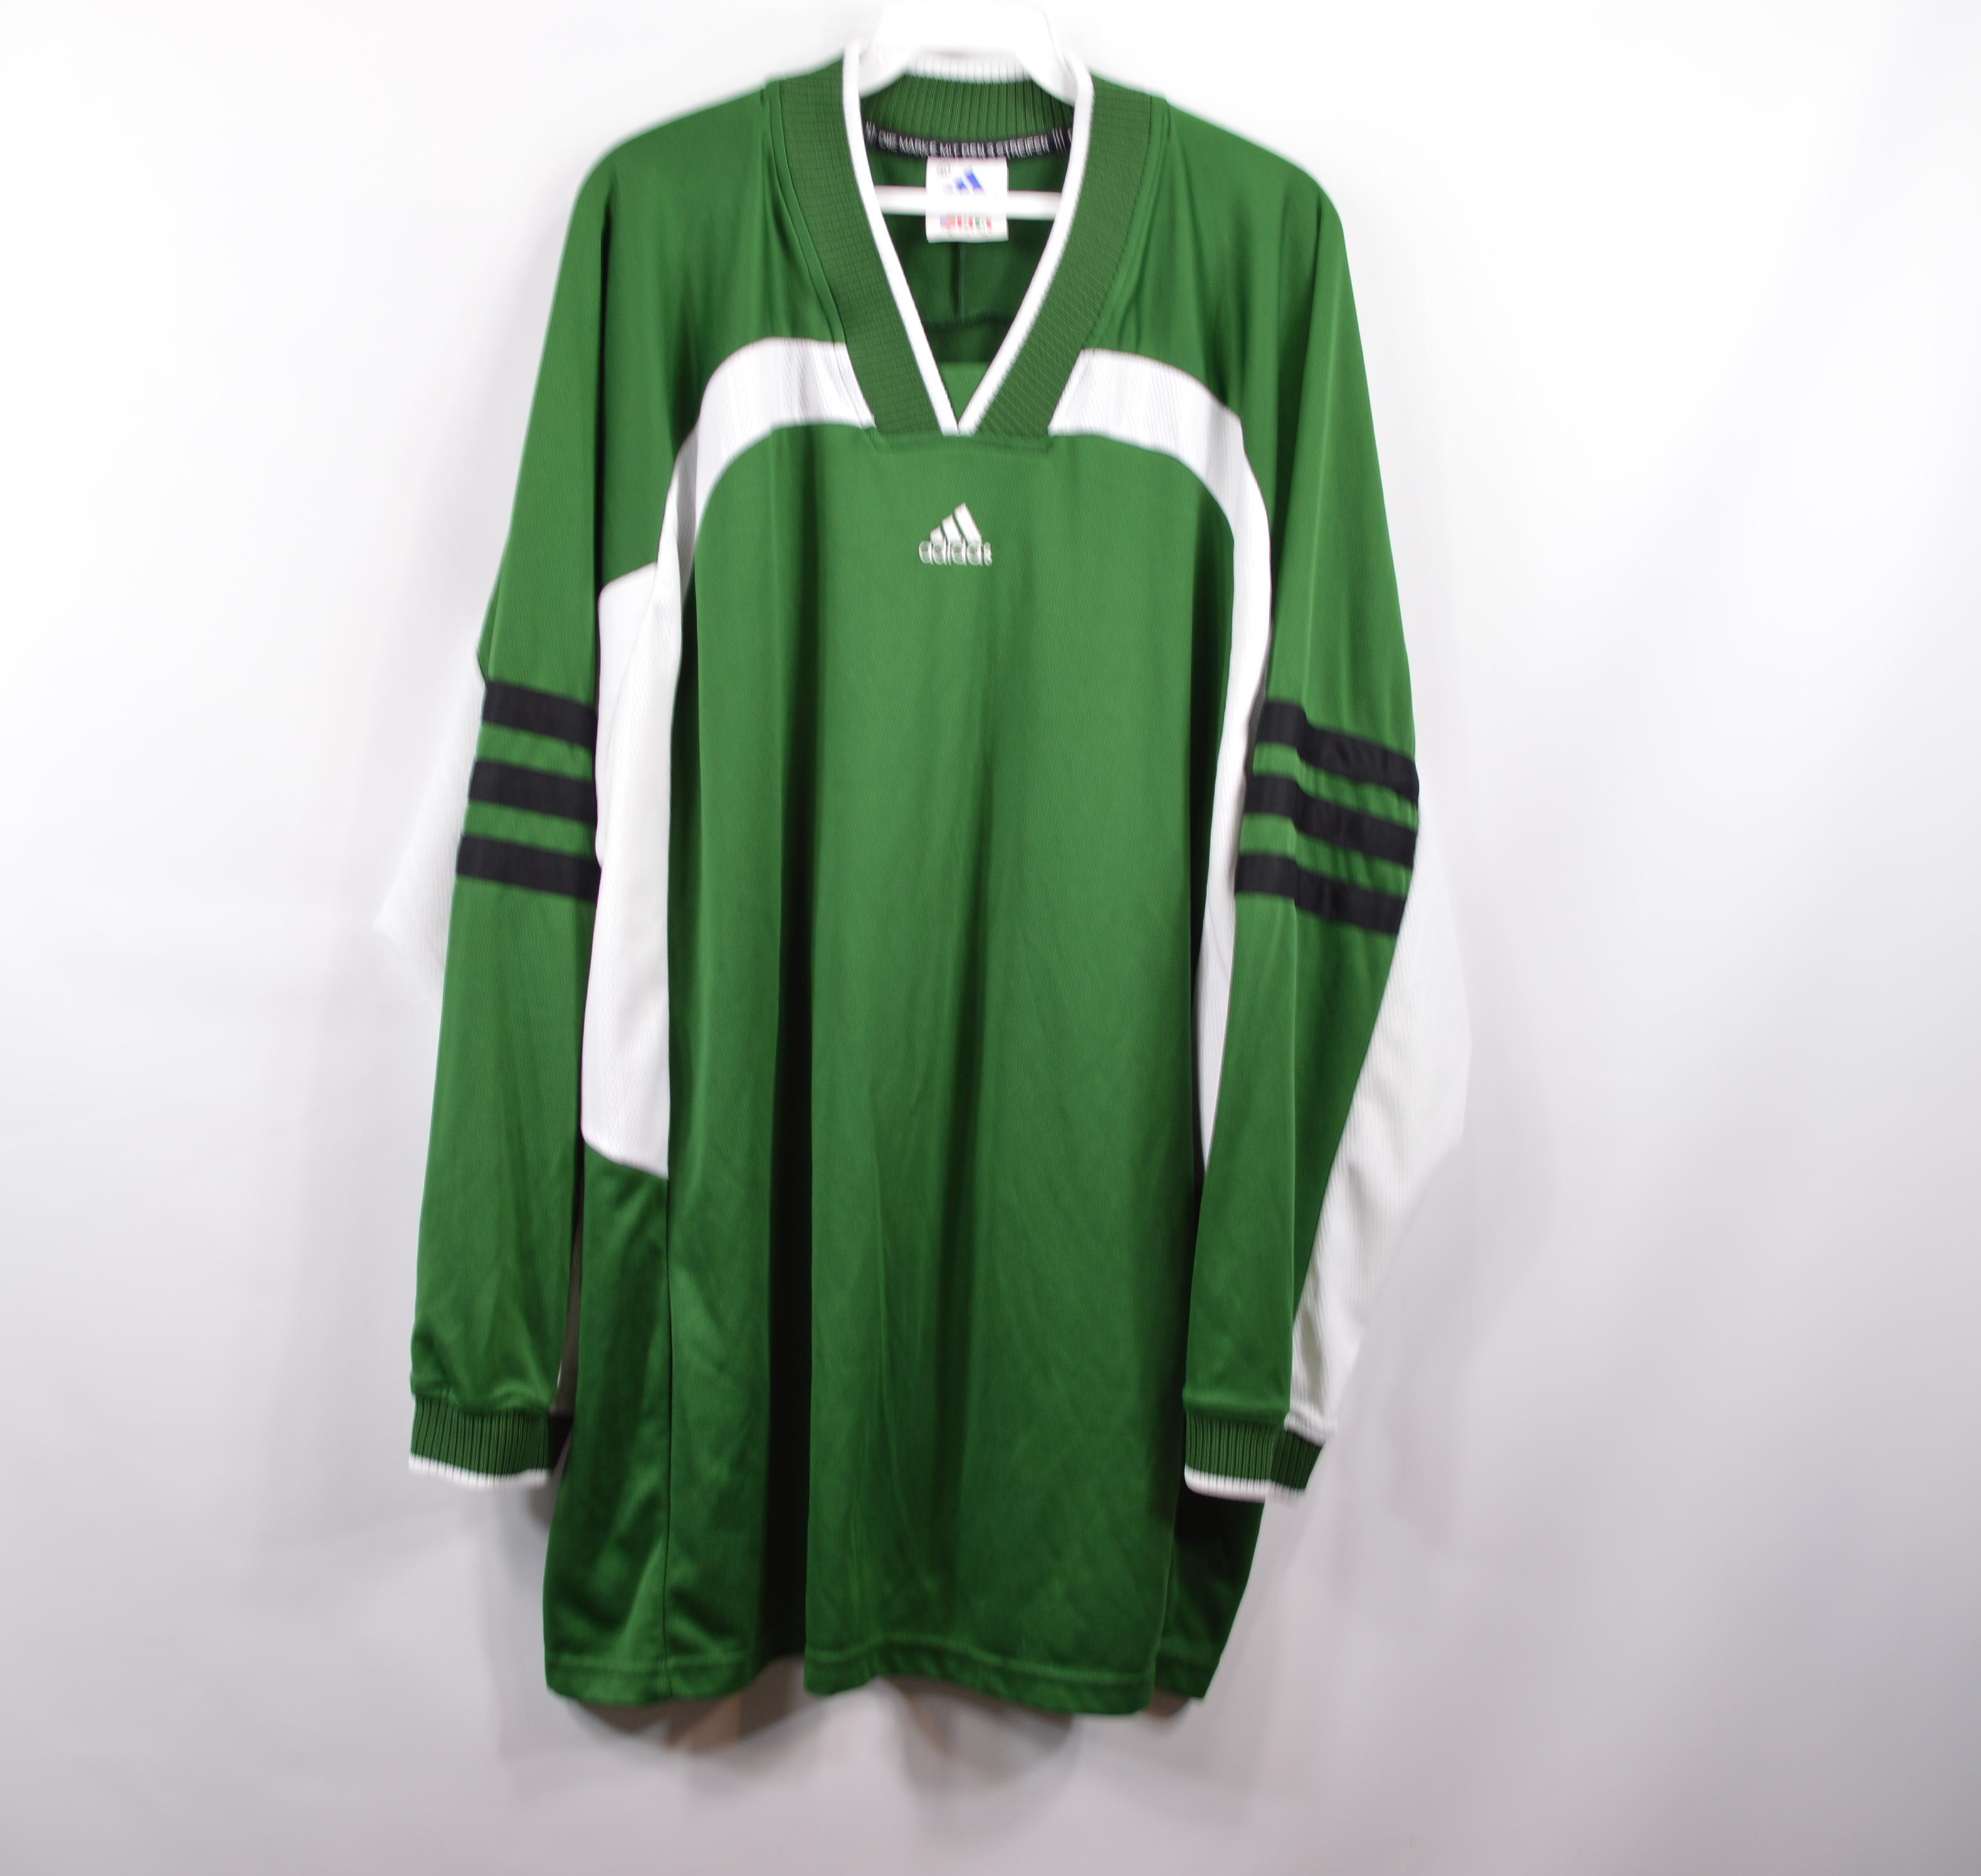 Adidas Vintage ADIDAS Mens XL Soccer Football Long Sleeve Goalkeeper Jersey Green